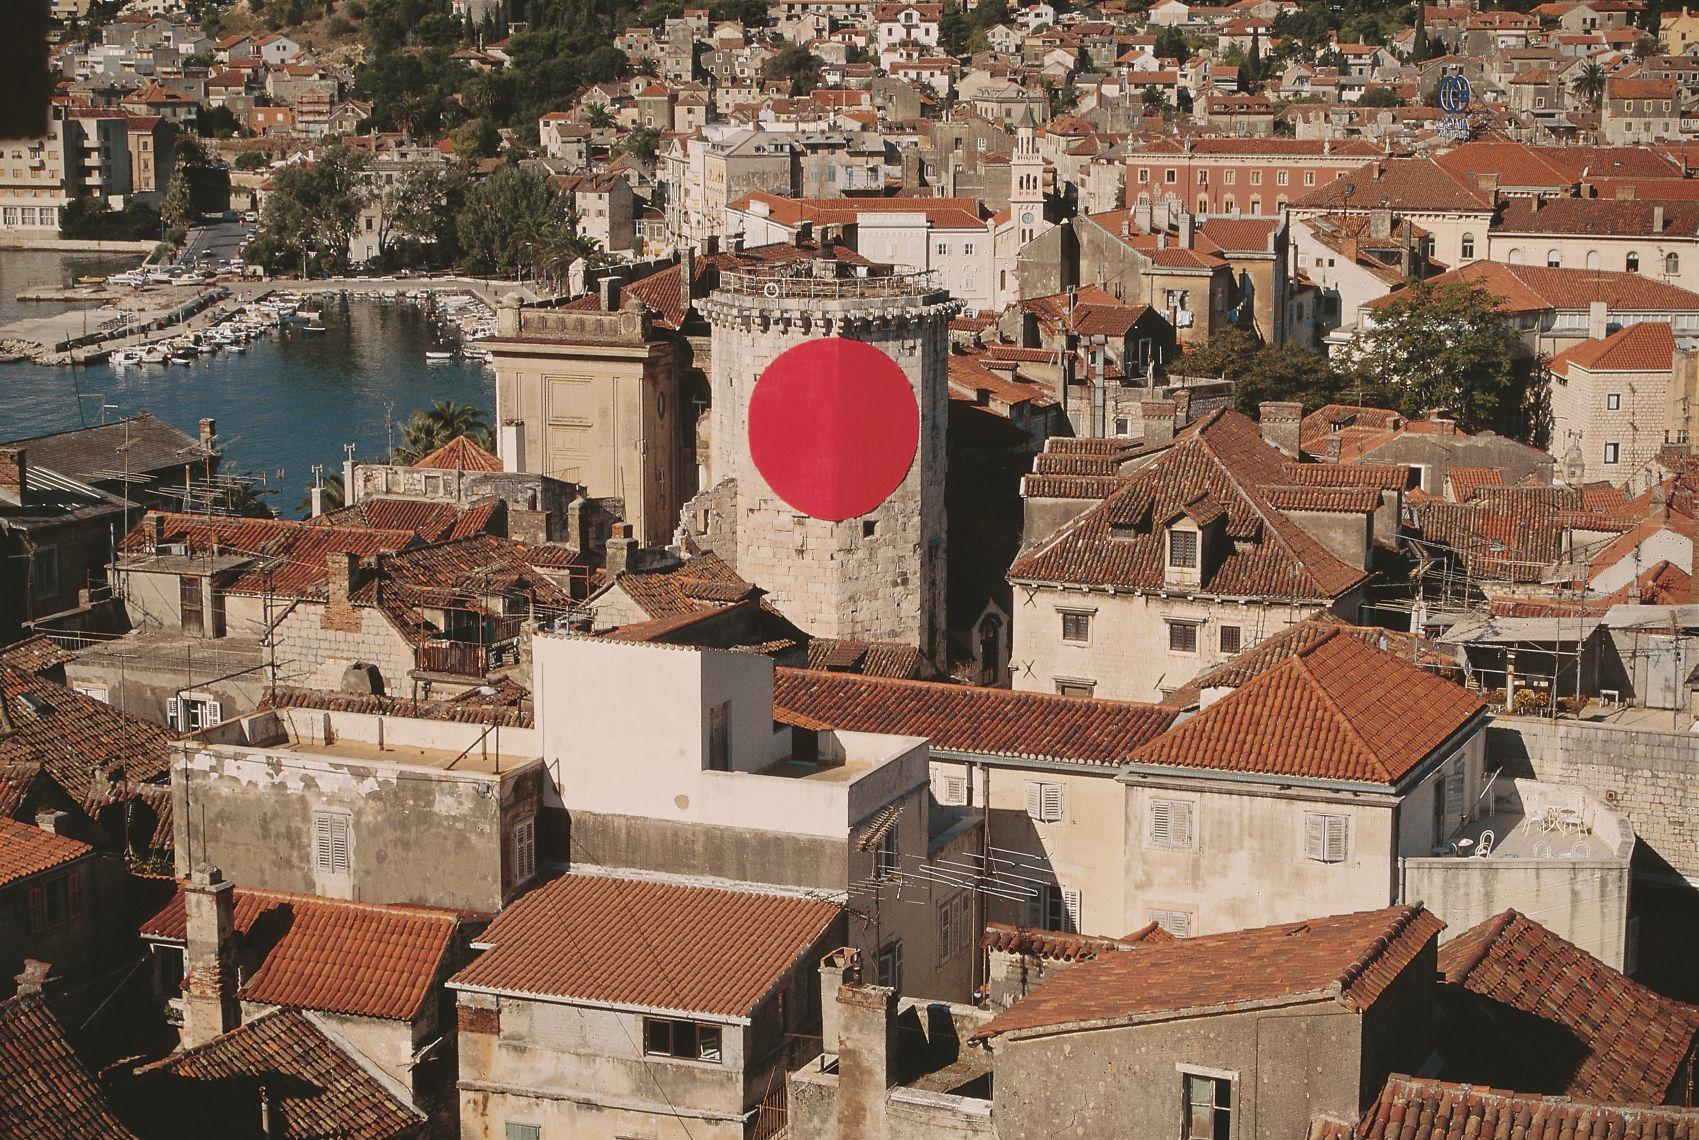 http://hrvatskifokus-2021.ga/wp-content/uploads/2020/07/dubravka-rakoci-mediteran-2020-1.jpg